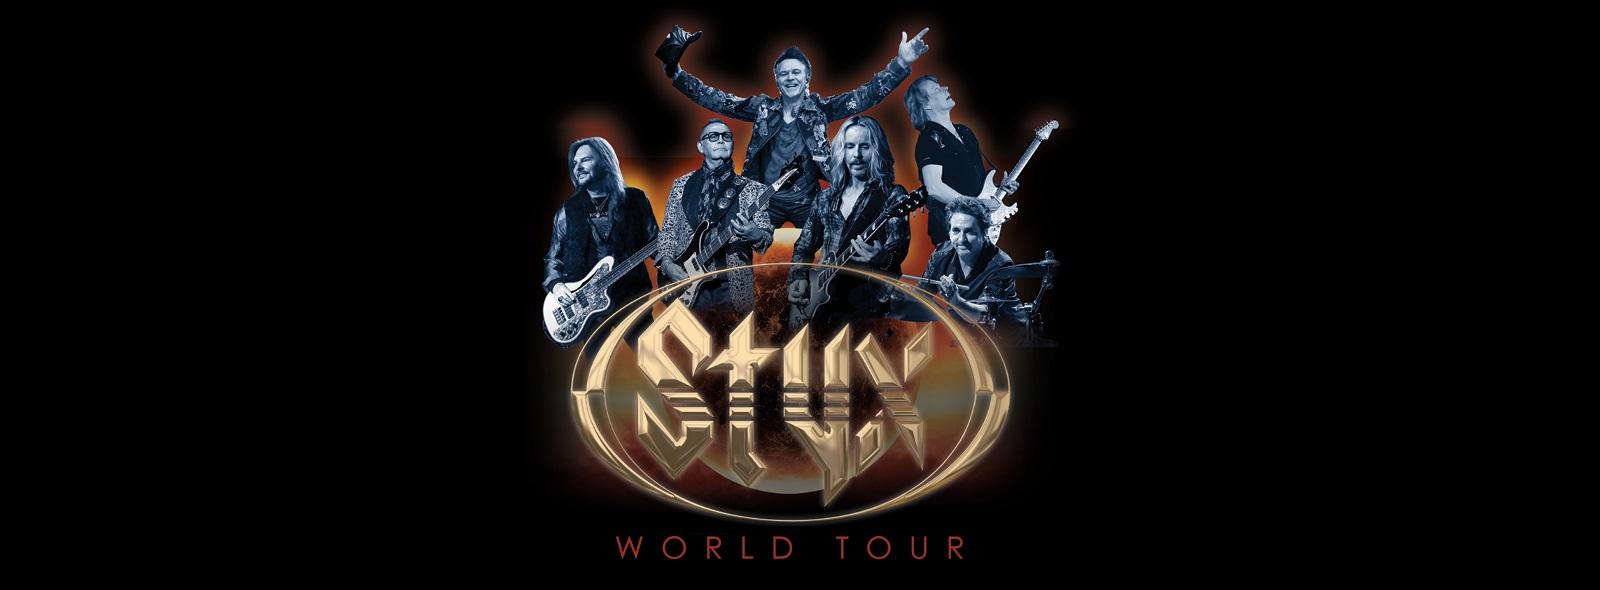 Styx World Tour @ DPAC